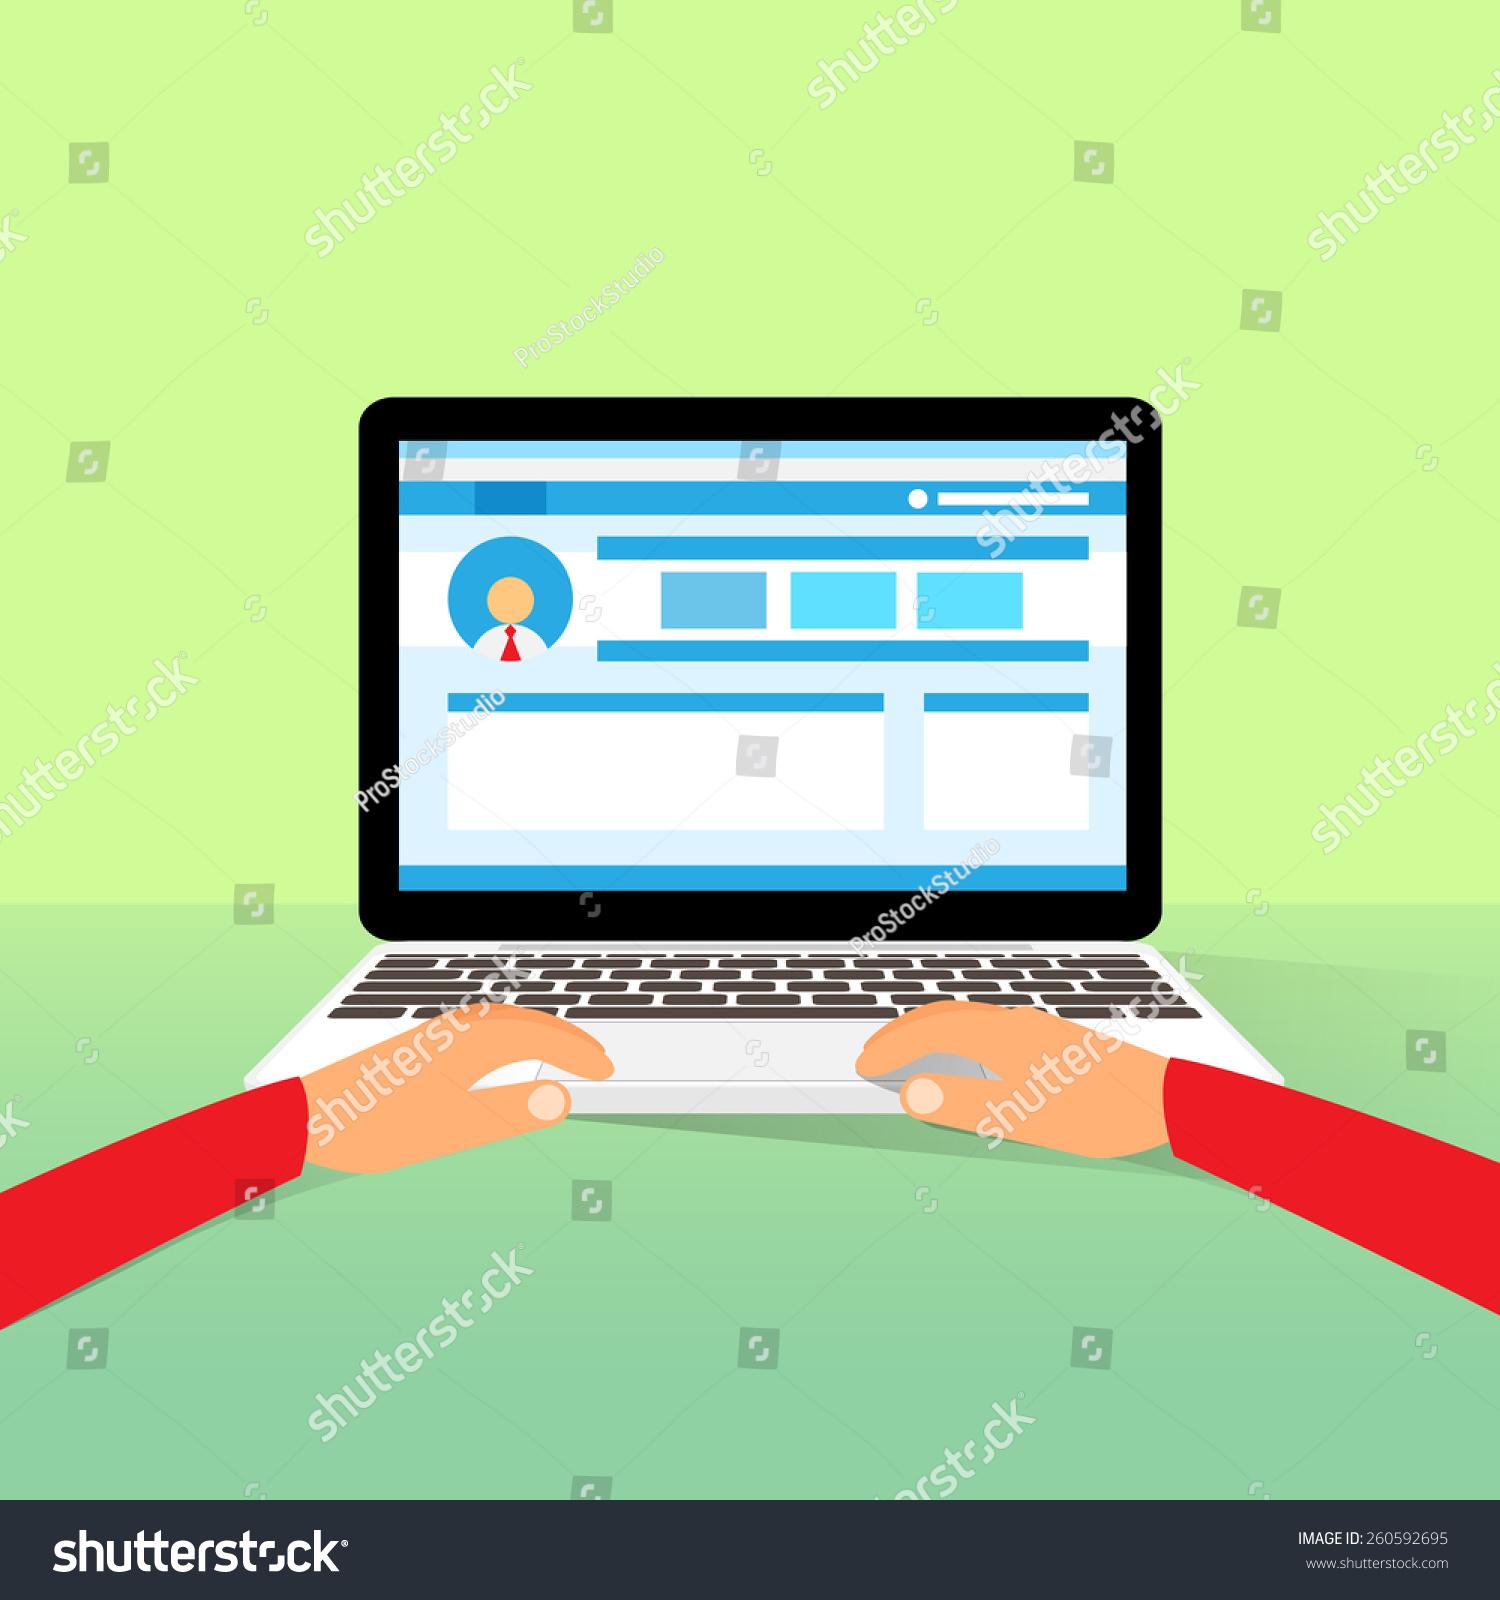 Laptop Hands Type Working Using Computer Stock Vector ... Laptop Vector Illustration